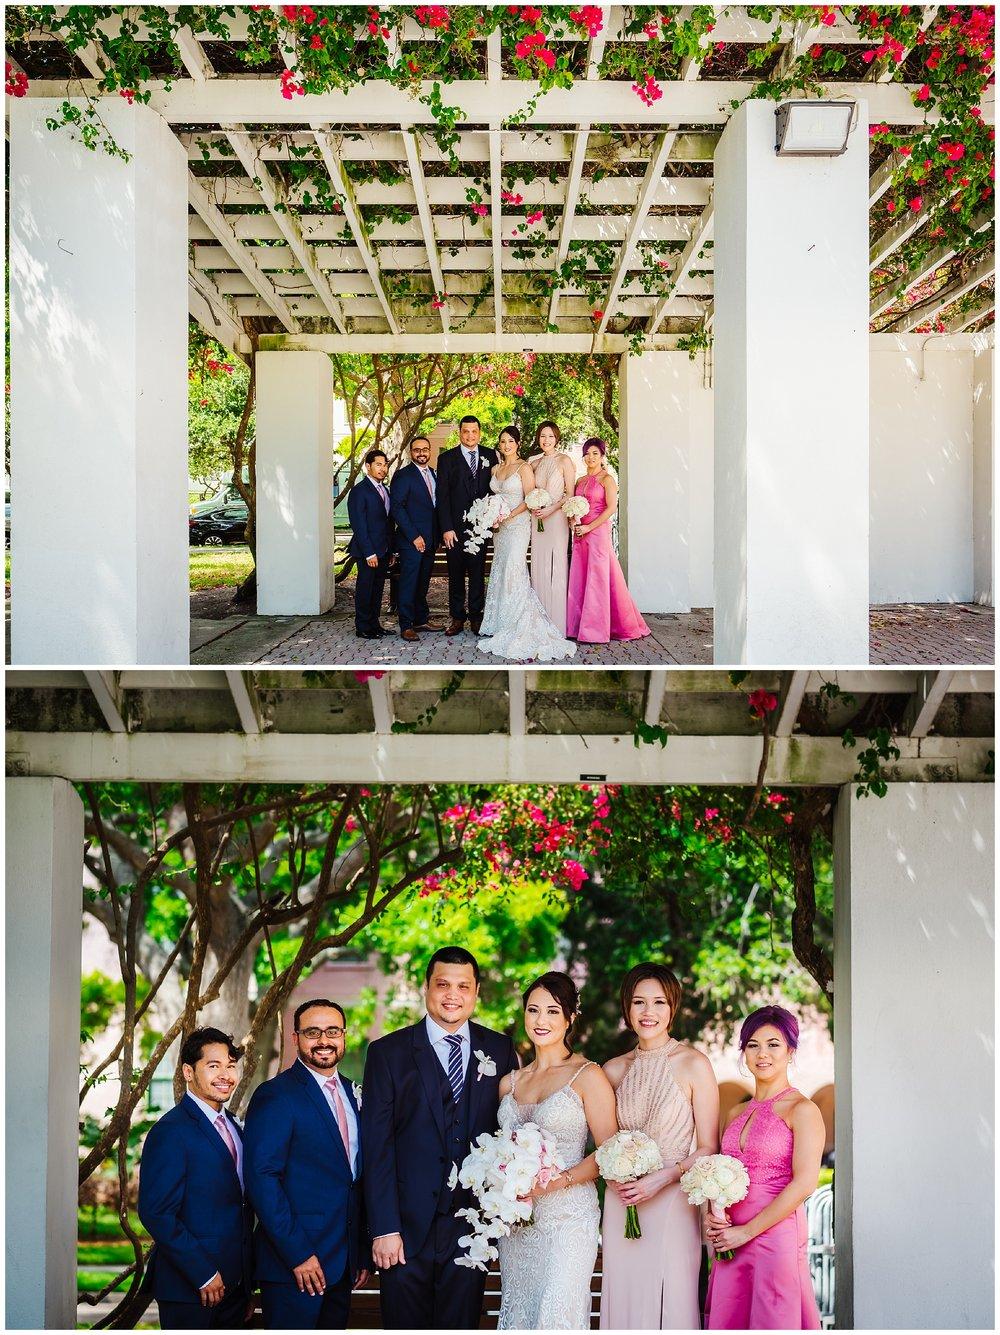 vinoy-sunset-ballroom-rainy-day-wedding-photography-orchids-trinidad-flawless-fetes-ashlee-hamon_0112.jpg